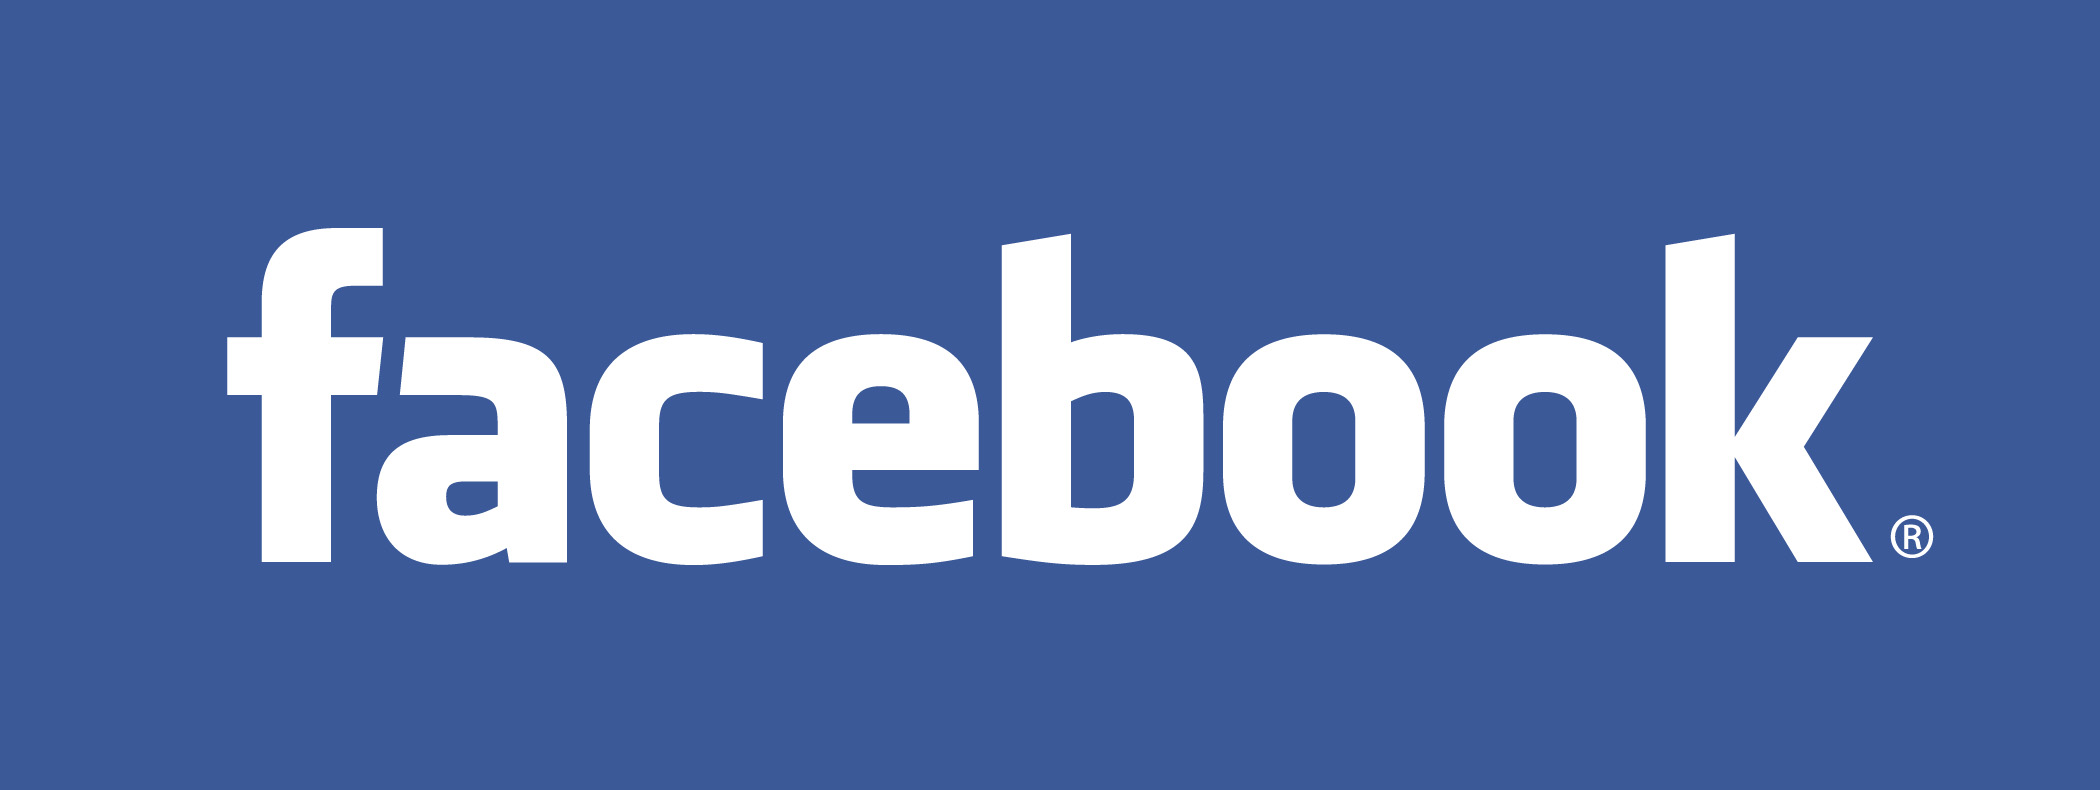 facebook_pic.jpg